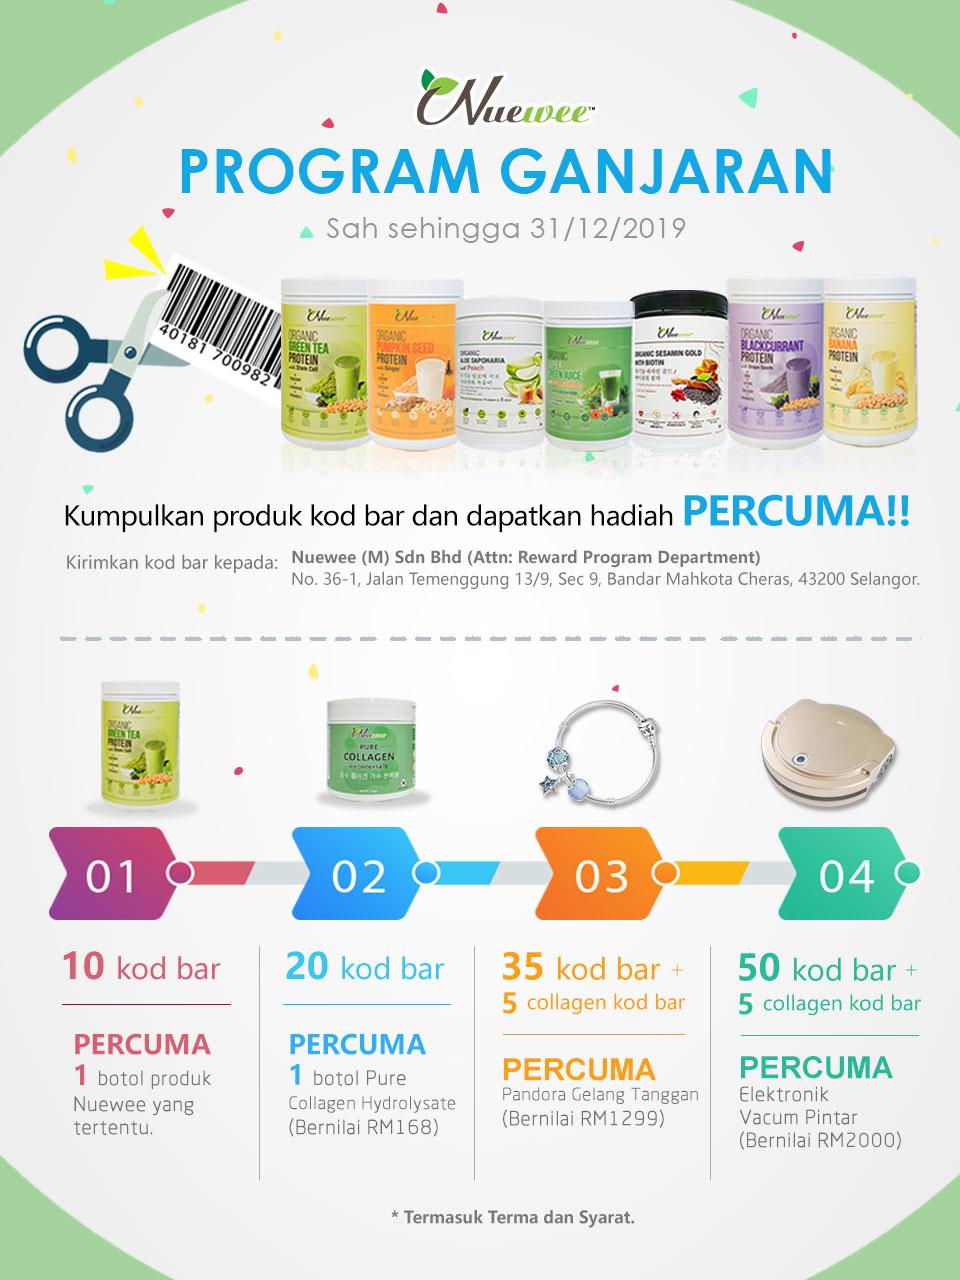 Nuewee-Organic-Products-Reward-Program-pandora-vacuum-robot-collagen2.jpg